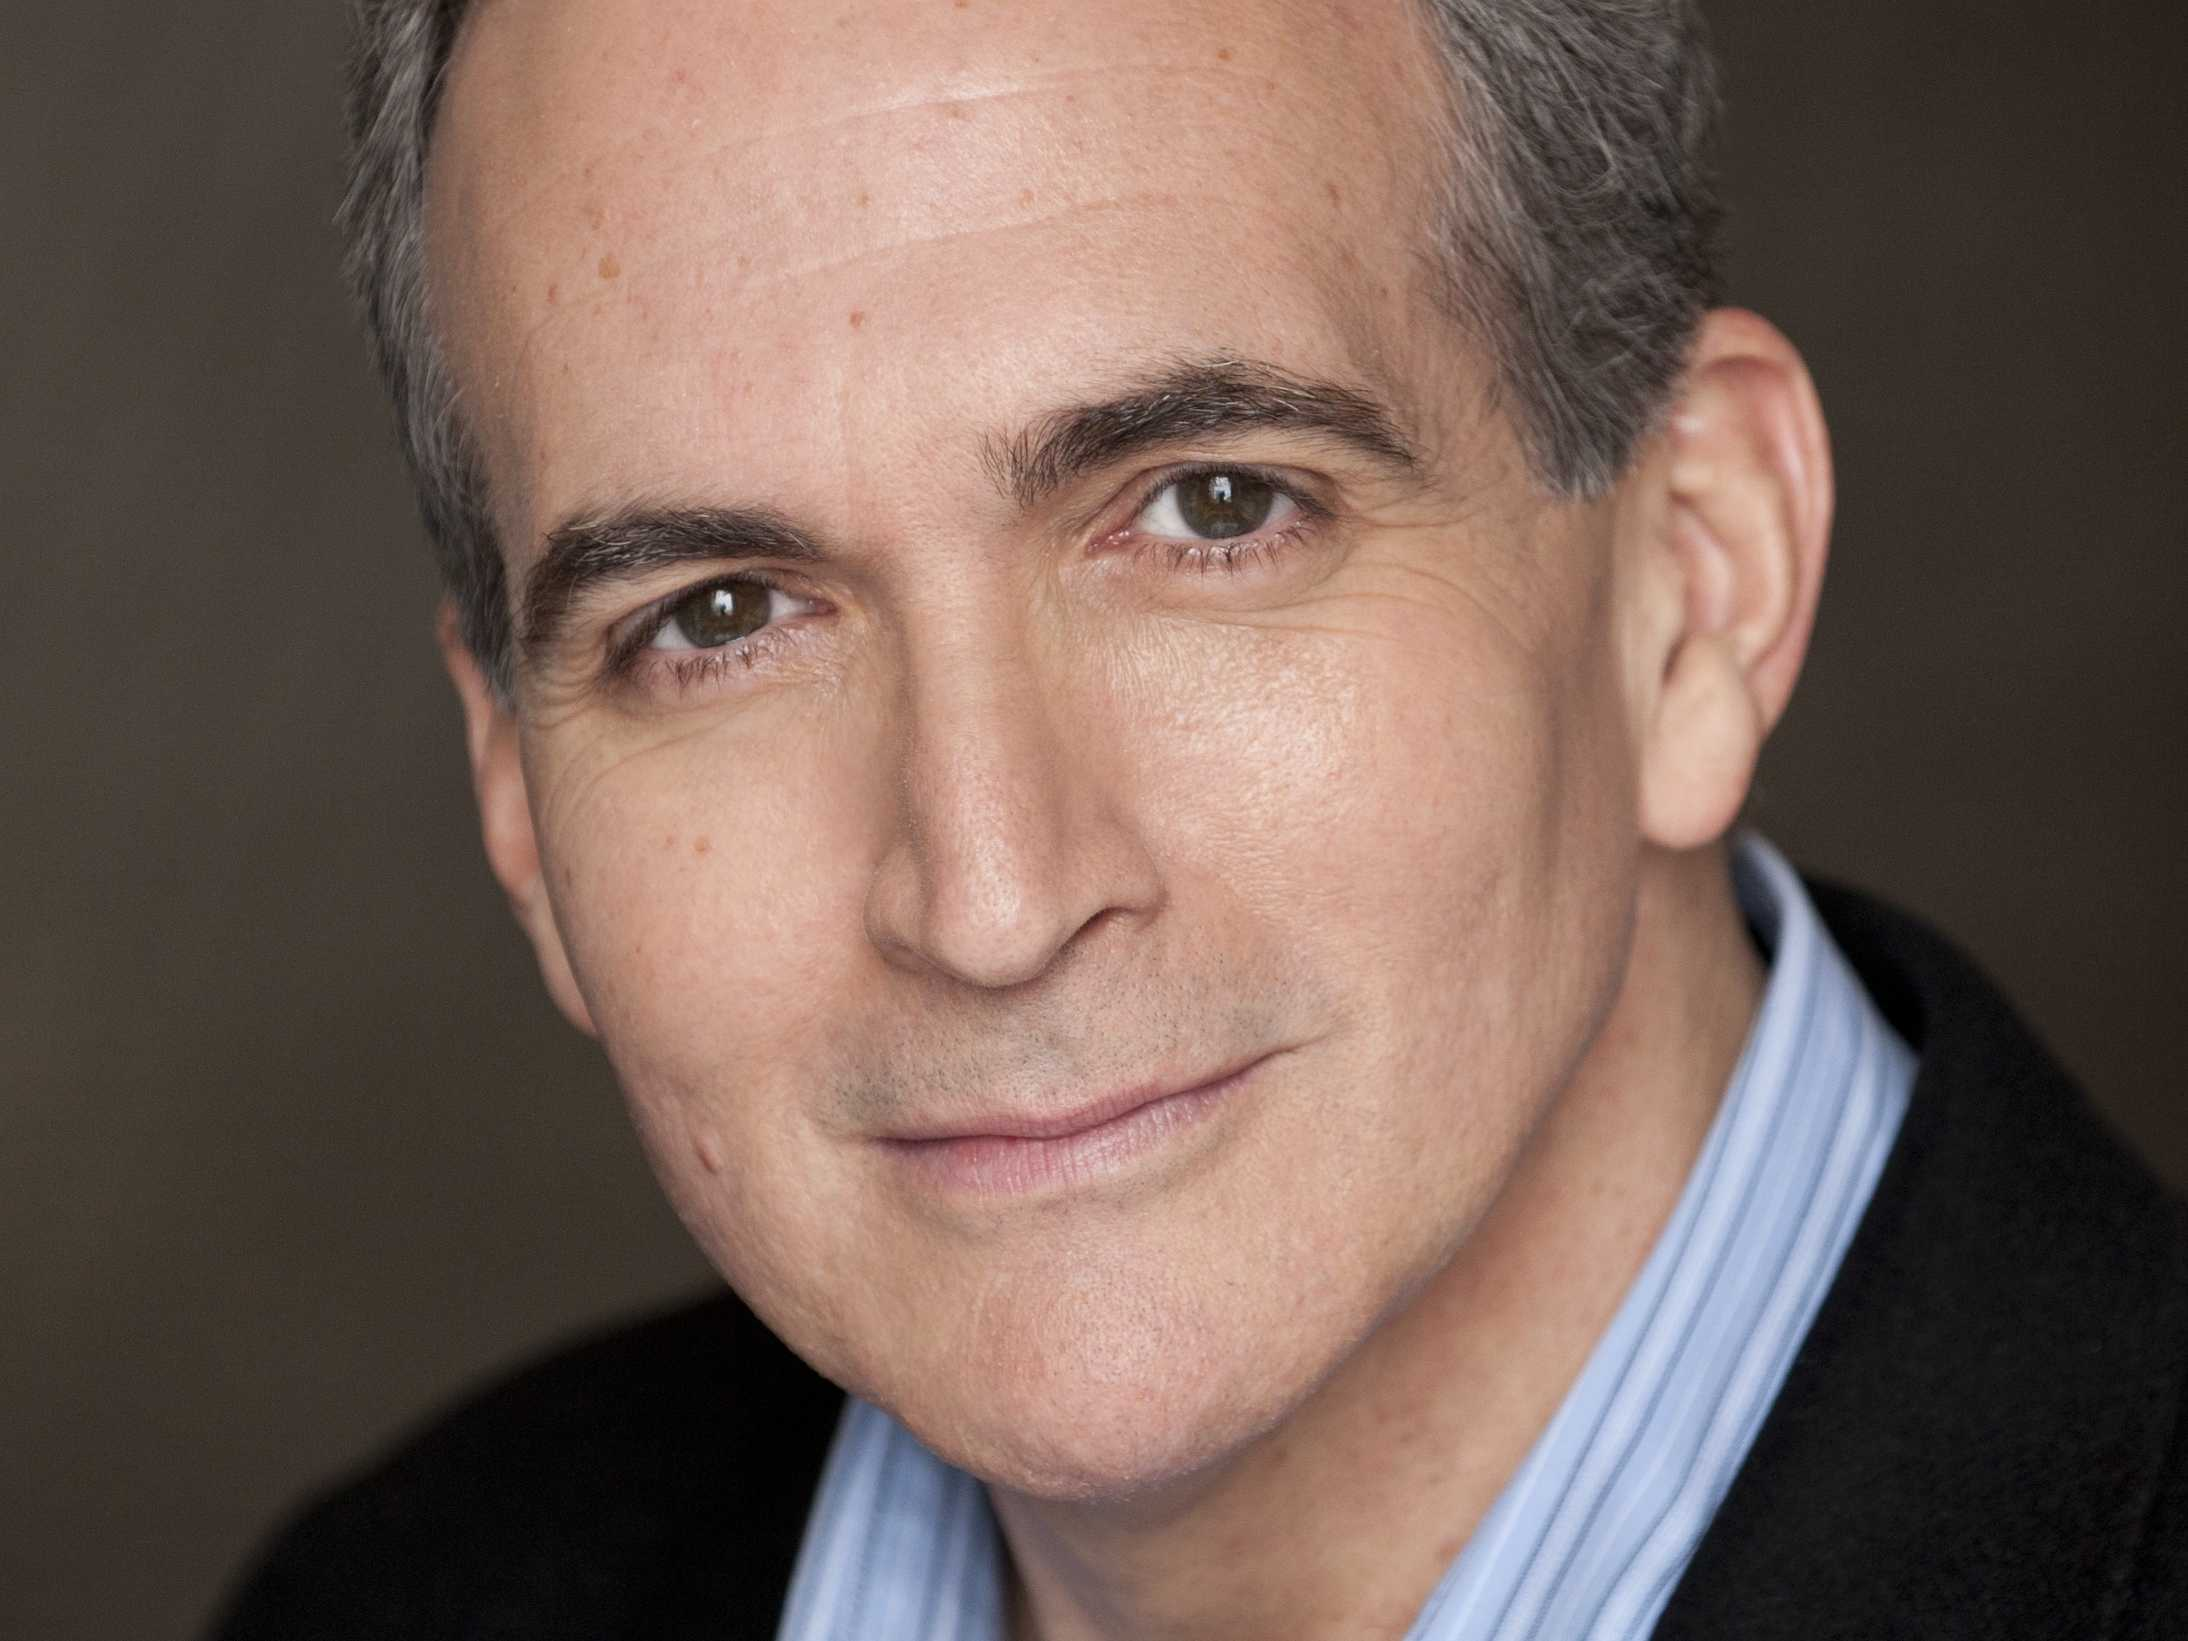 Broadway Vet Joel Briel Stars in Raucous 'The Producers'